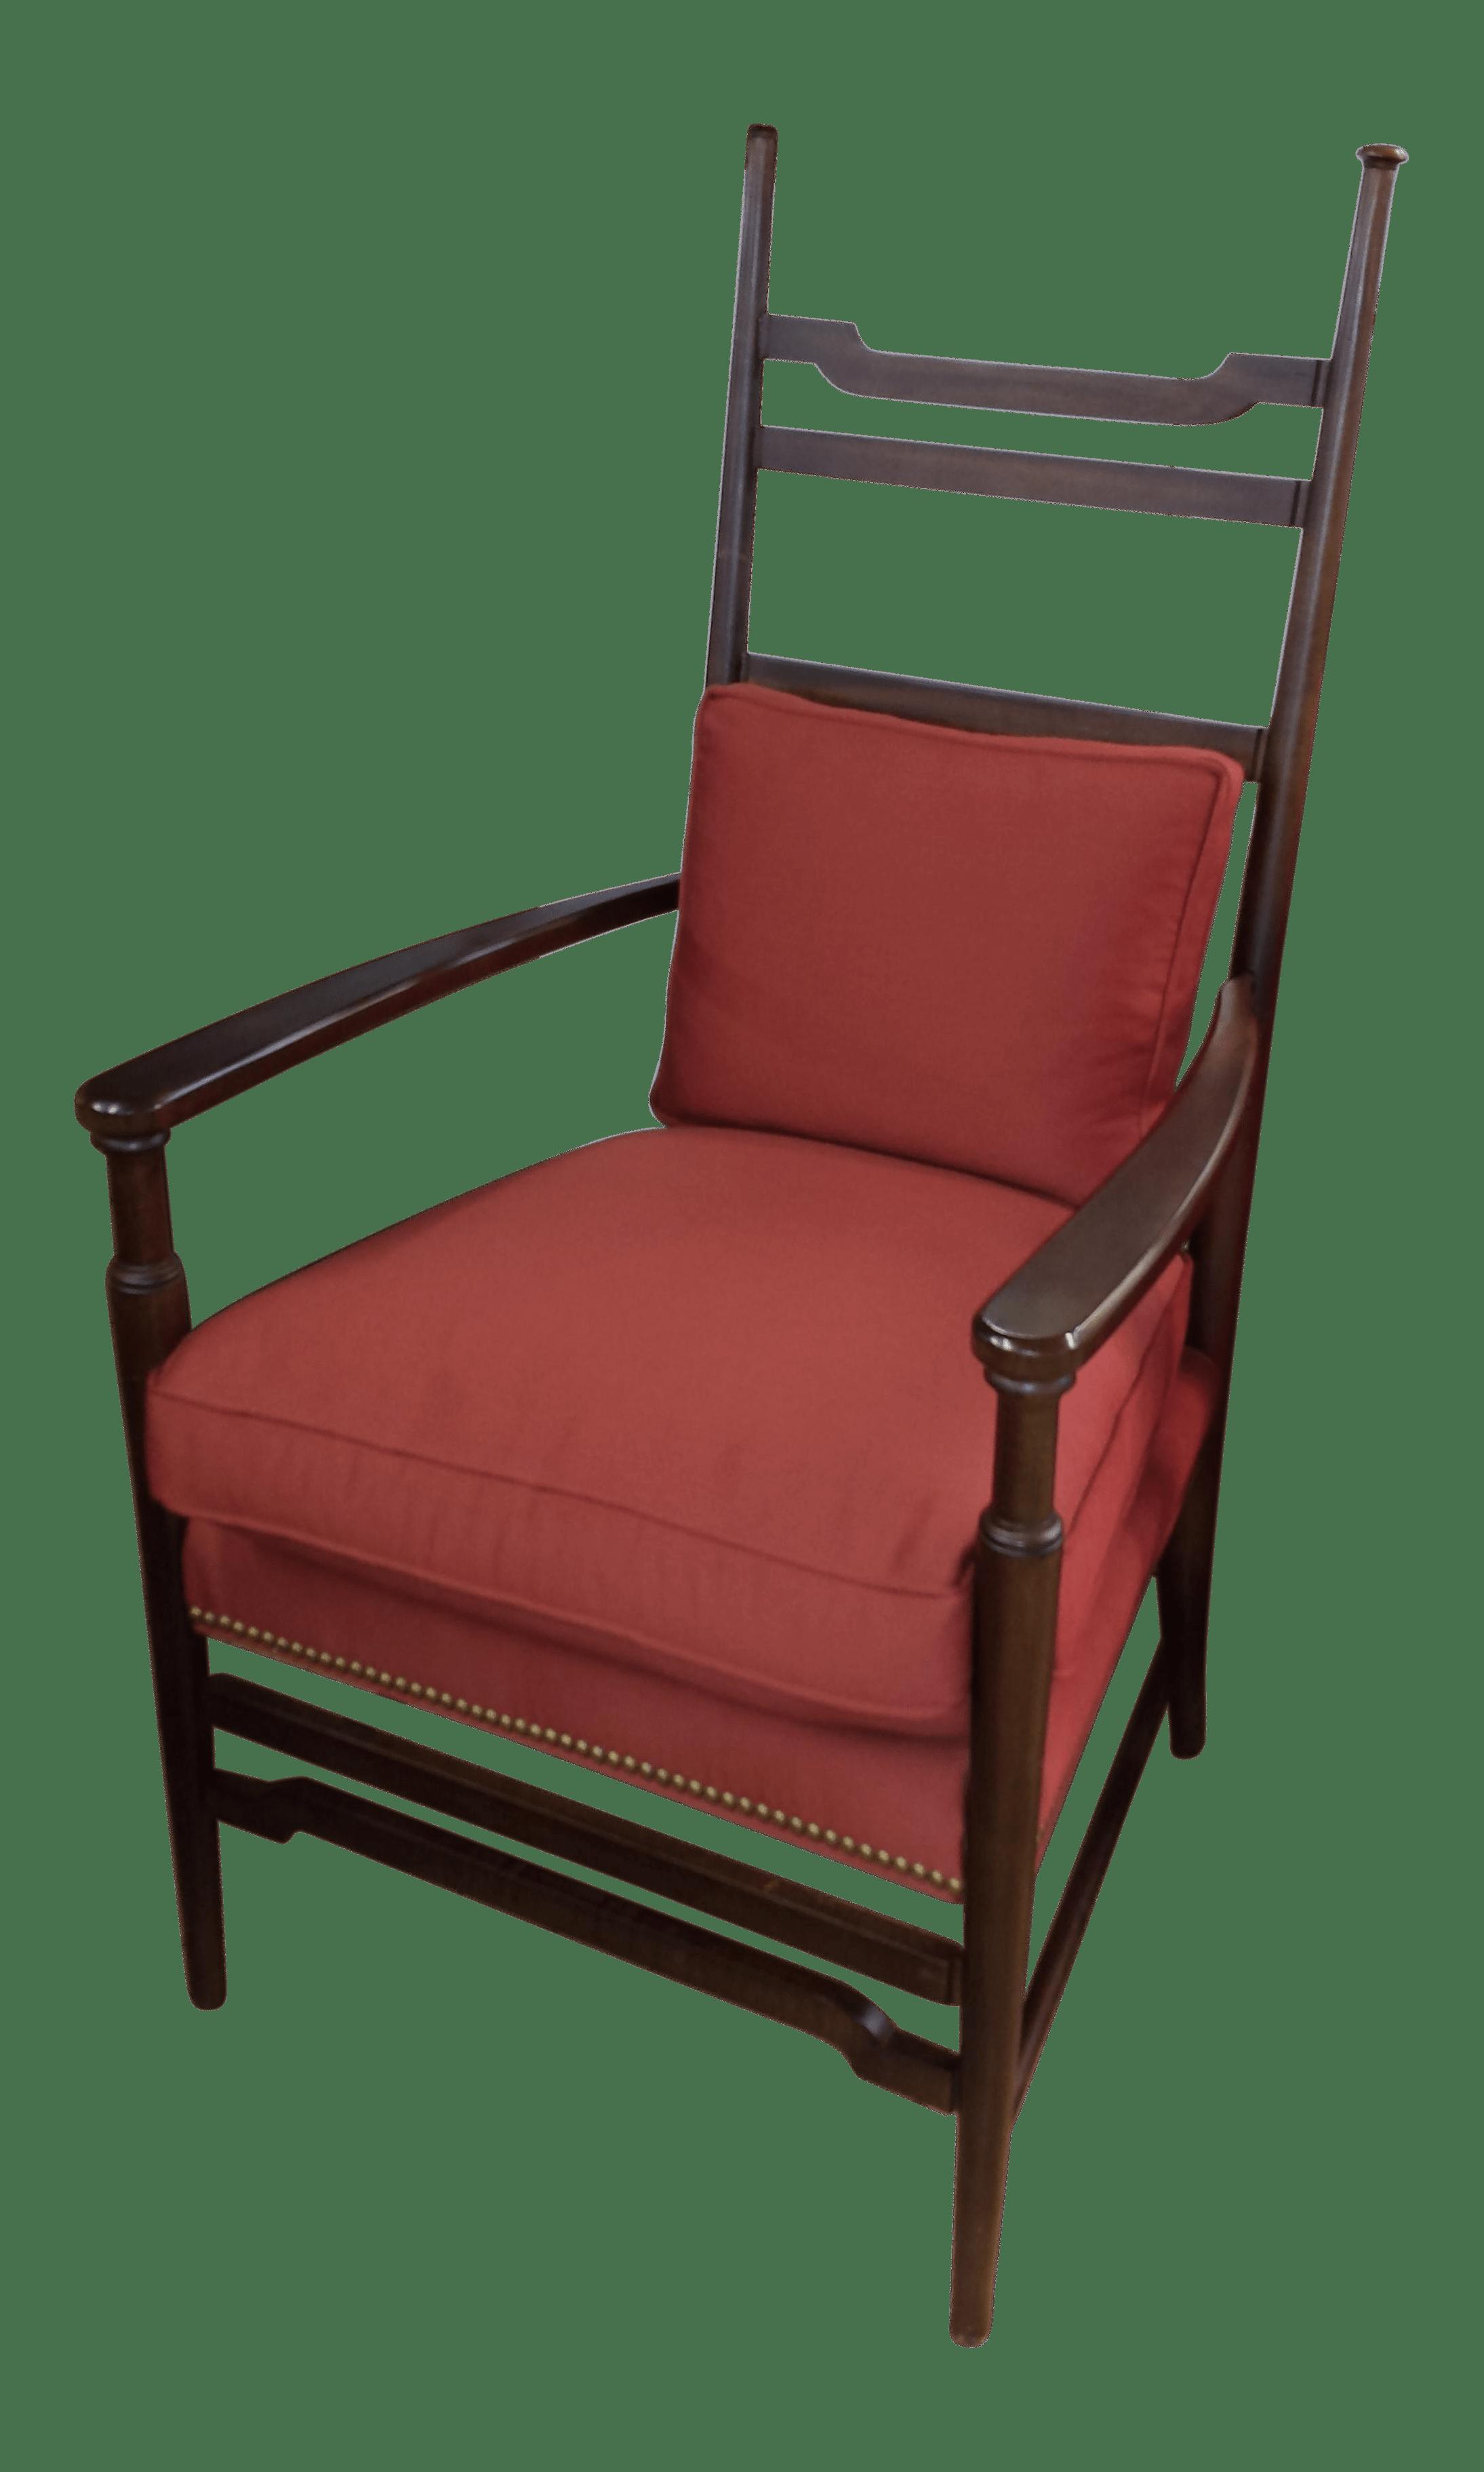 shaker ladder back chair swivel tub chairs hickory modern ladderback chairish